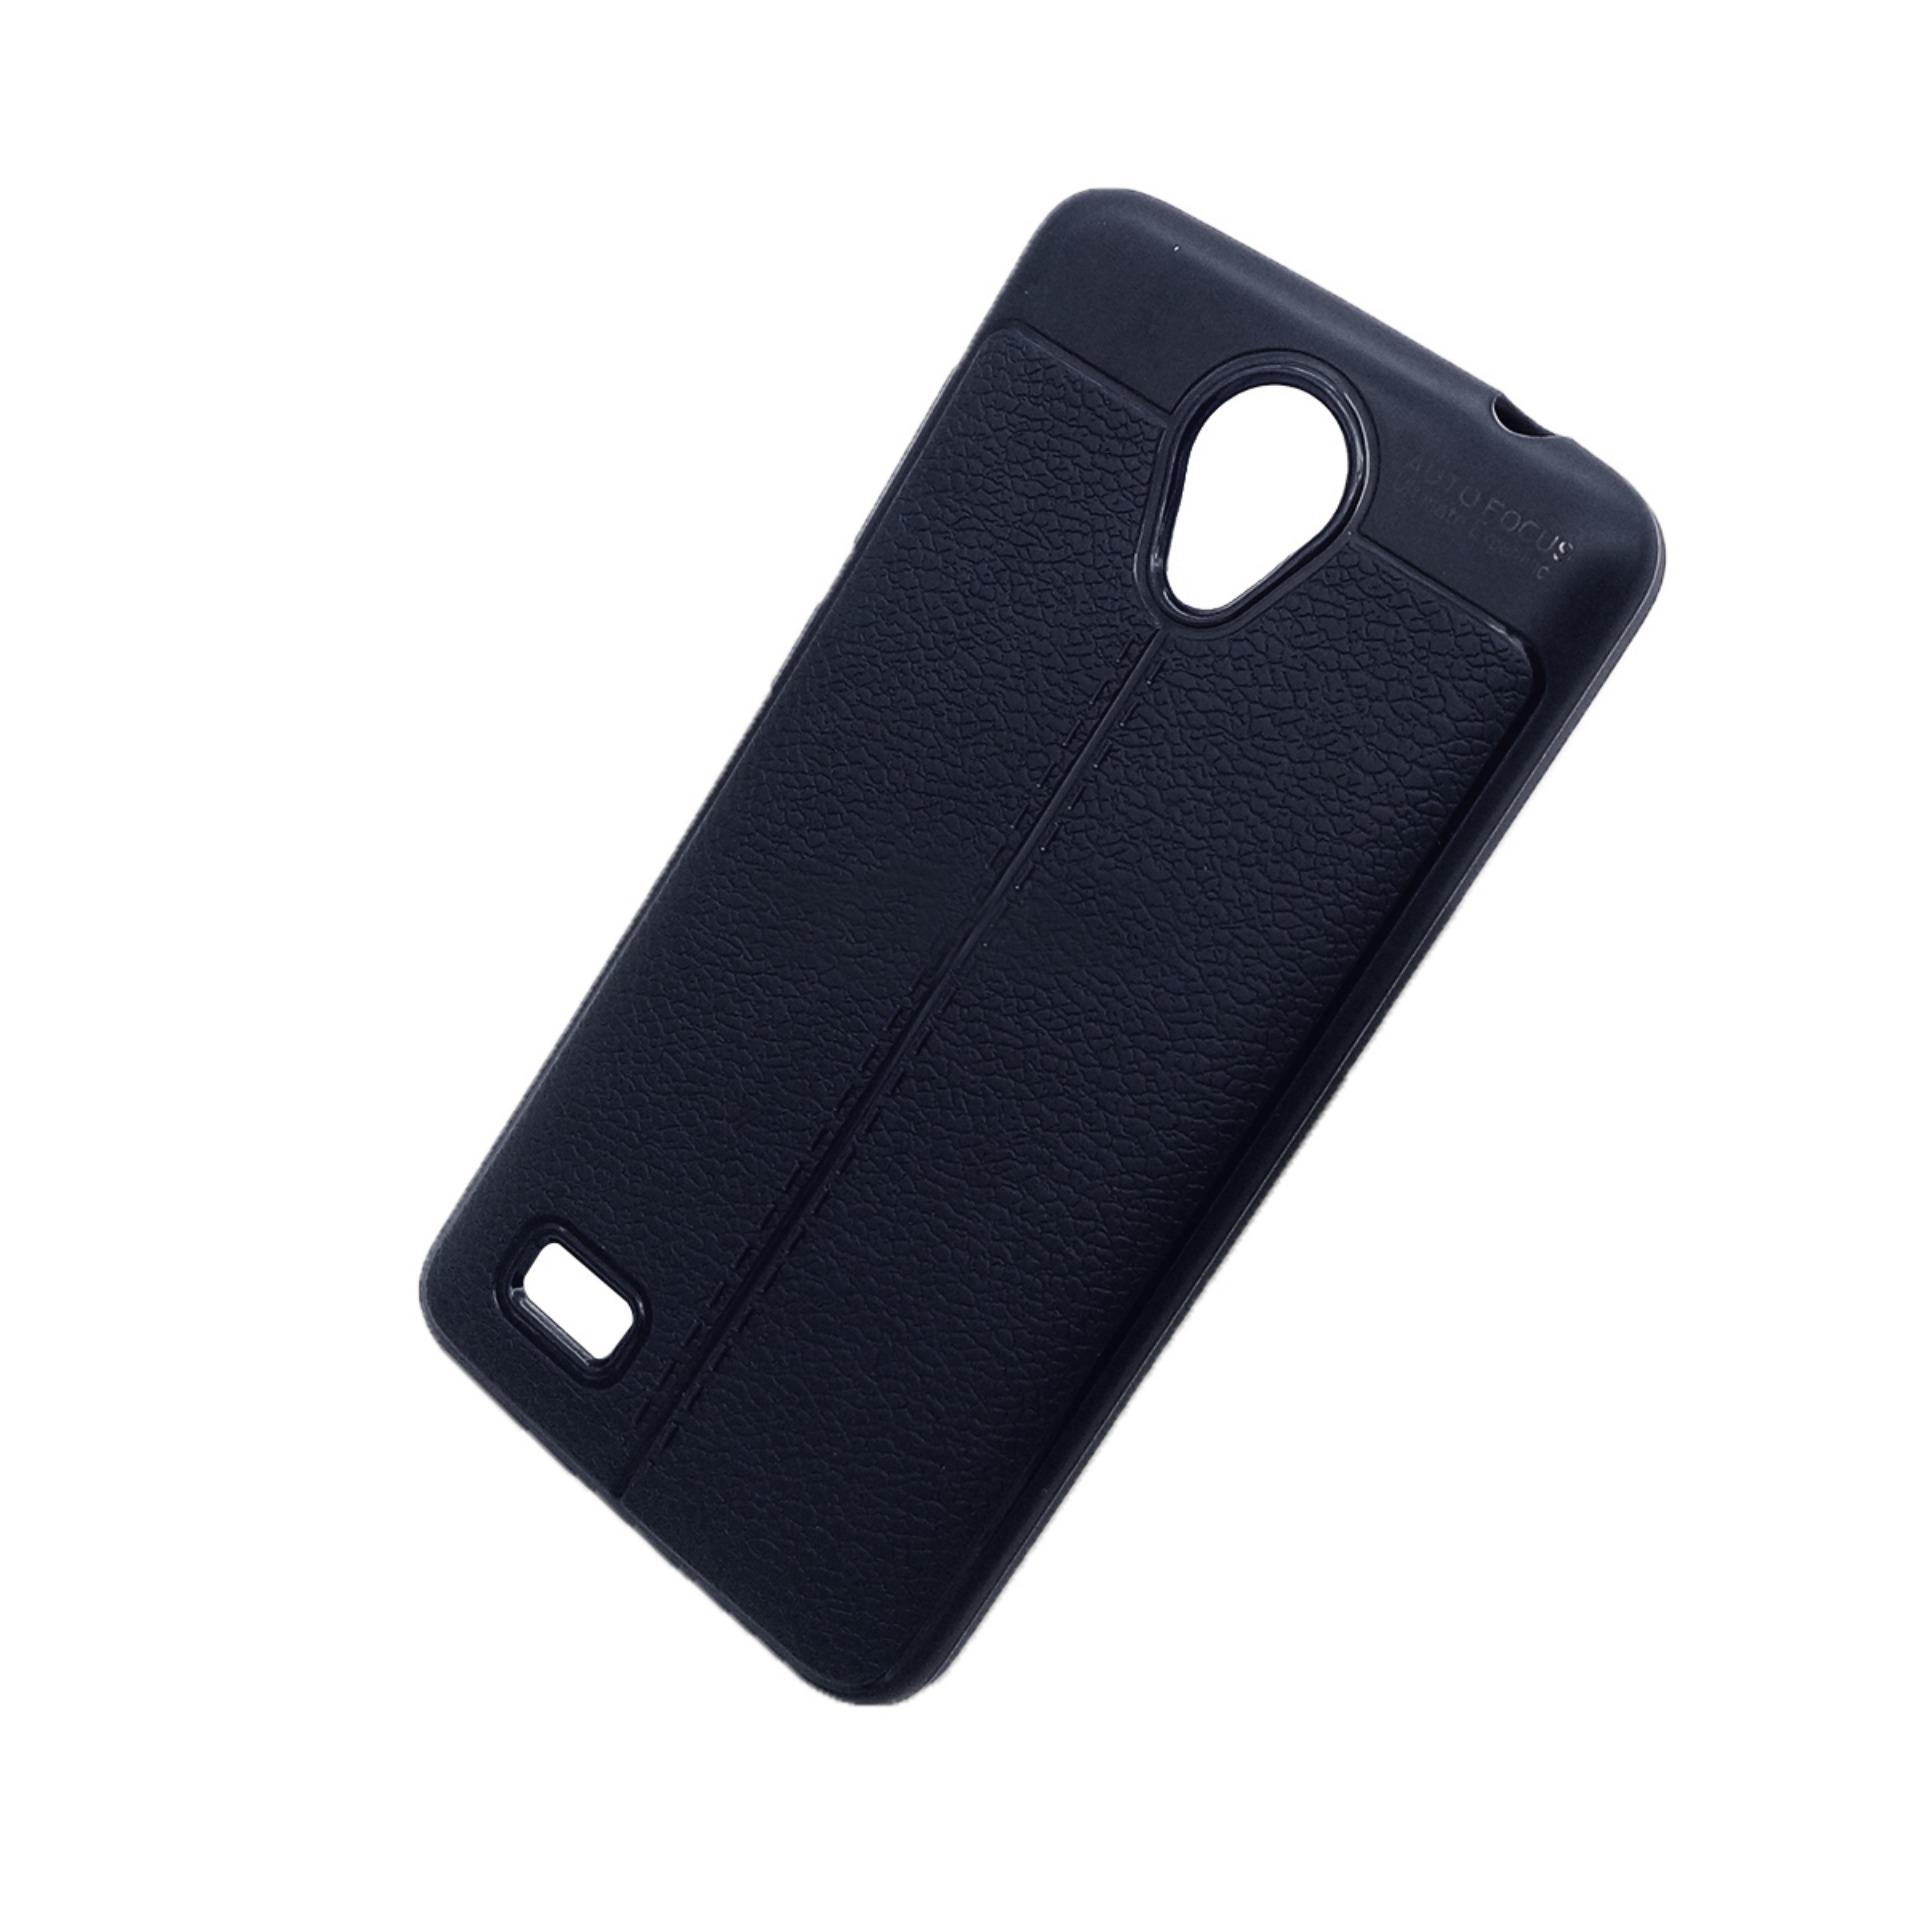 Aimi Flipcover Vivo Y21 Coklat5 Harga Terkini Dan Terlengkap Galeno Flip Cover Lenovo Vibe K4 Note Coklat Lapak Case Leather Ultimate Experience Shockproof Premium Quality Hybrid For